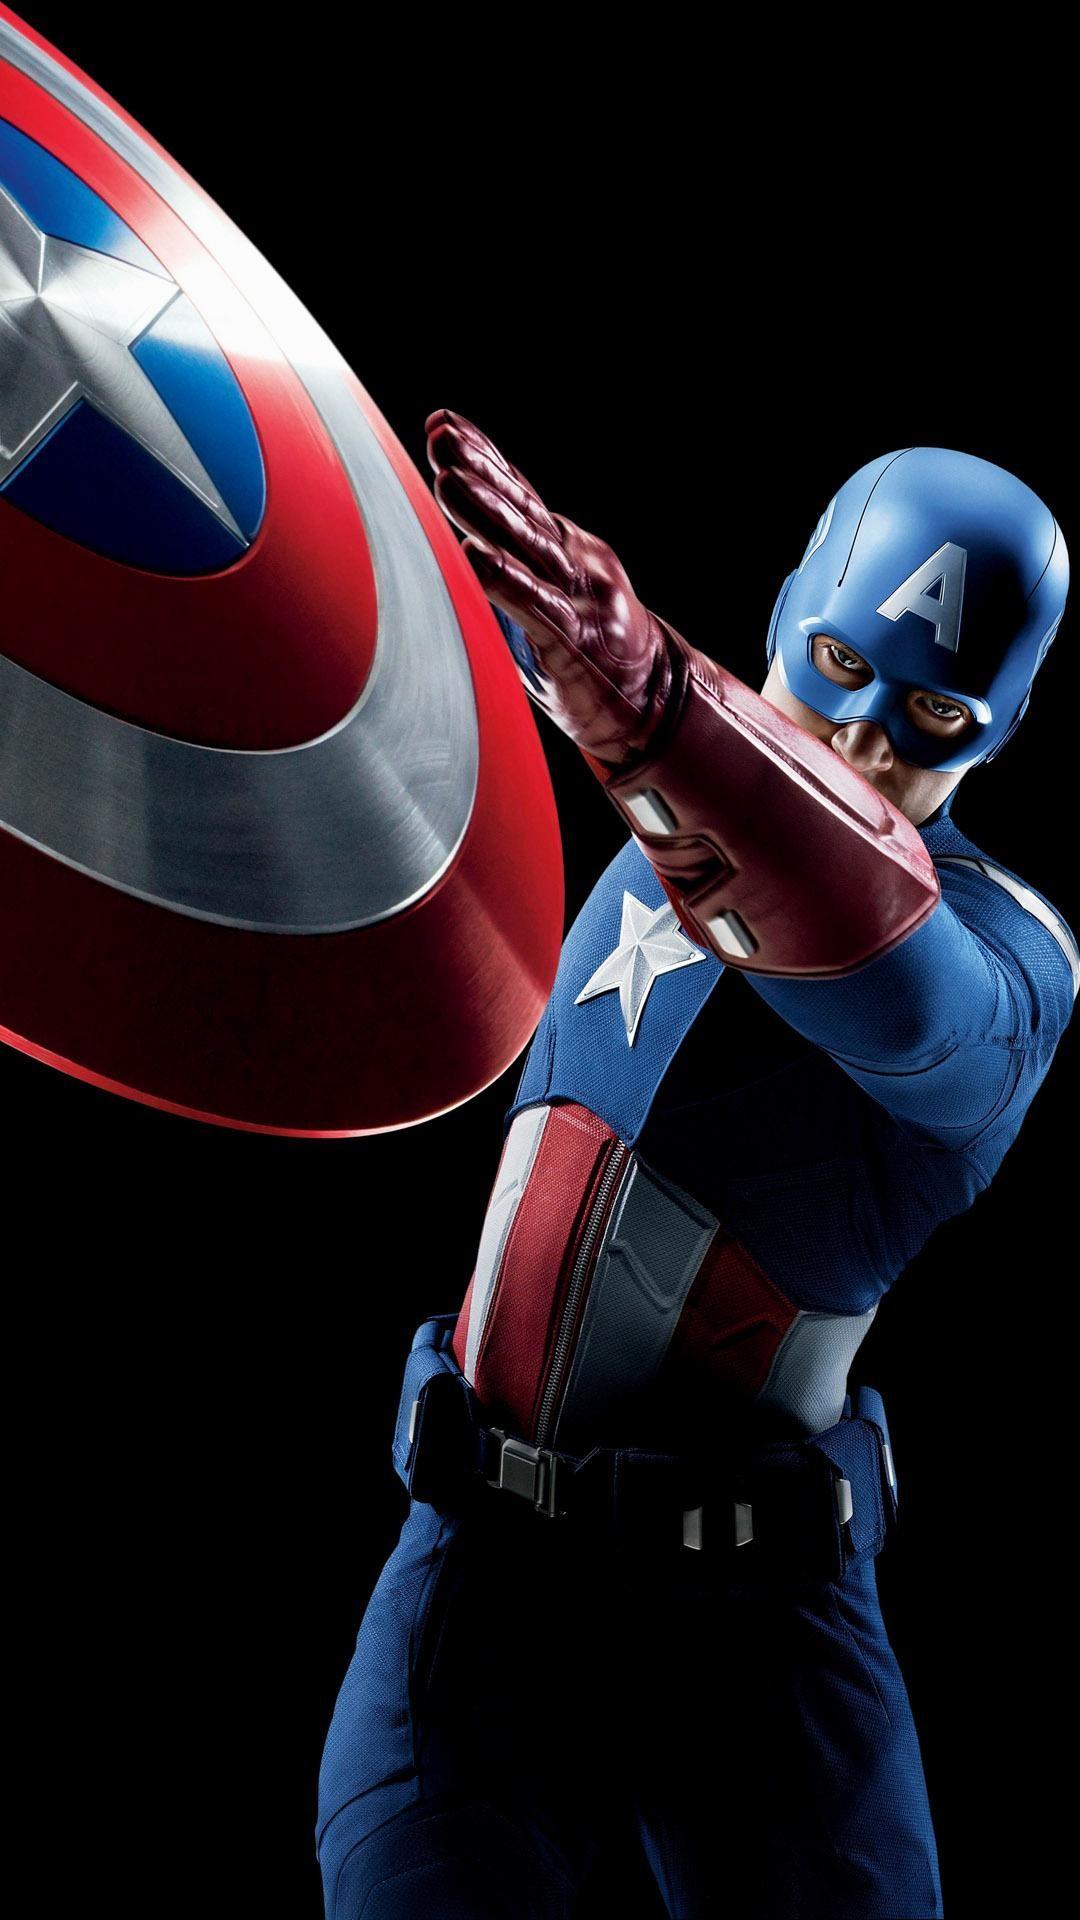 wallpaper.wiki-Captain-America-iPhone-Photos-PIC-WPD0011141